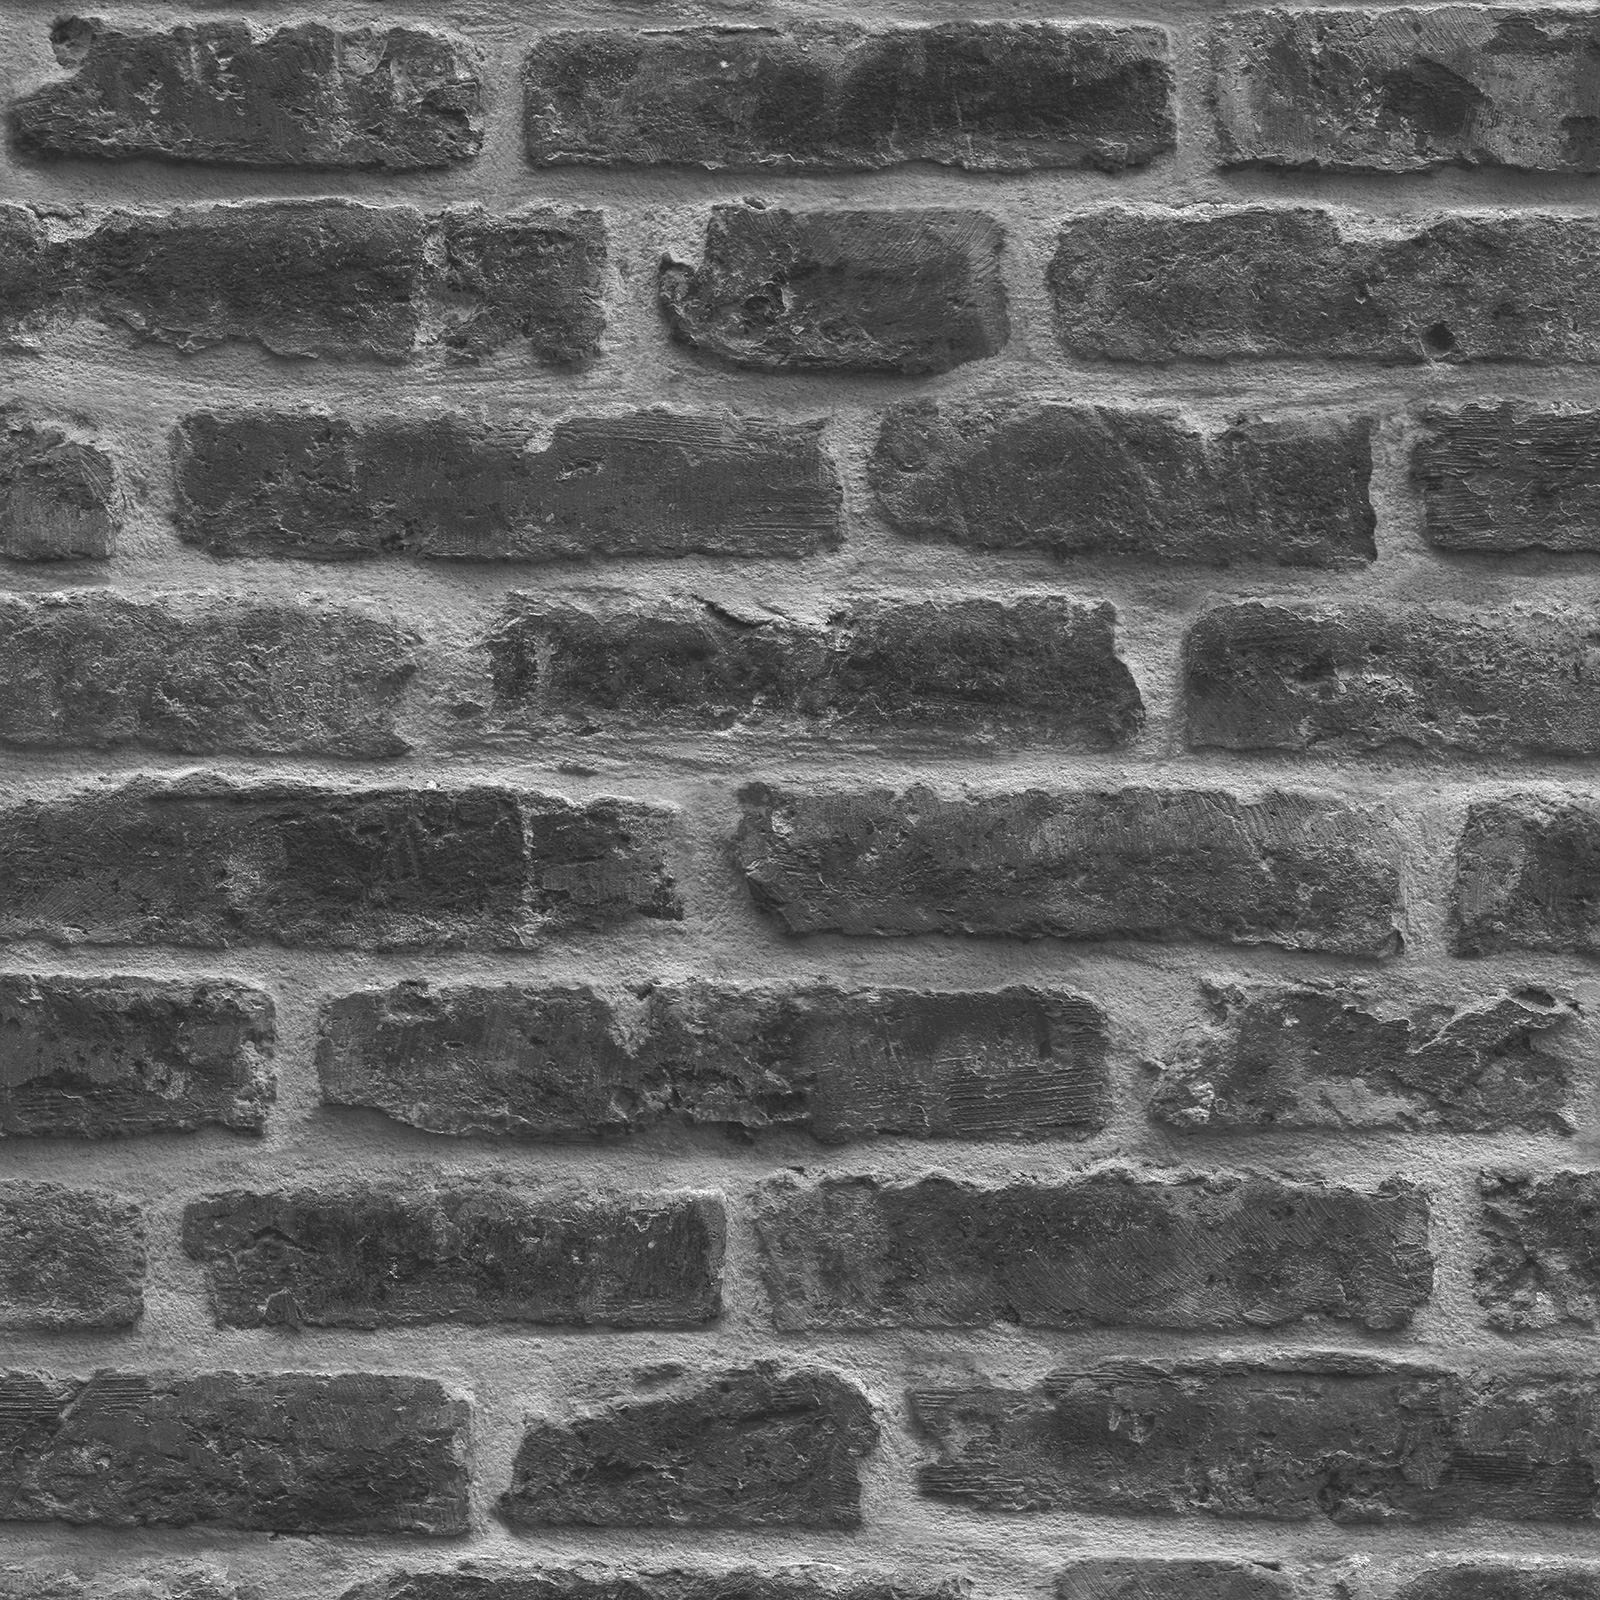 RUSTIC BRICK WALL WALLPAPER ROLLS